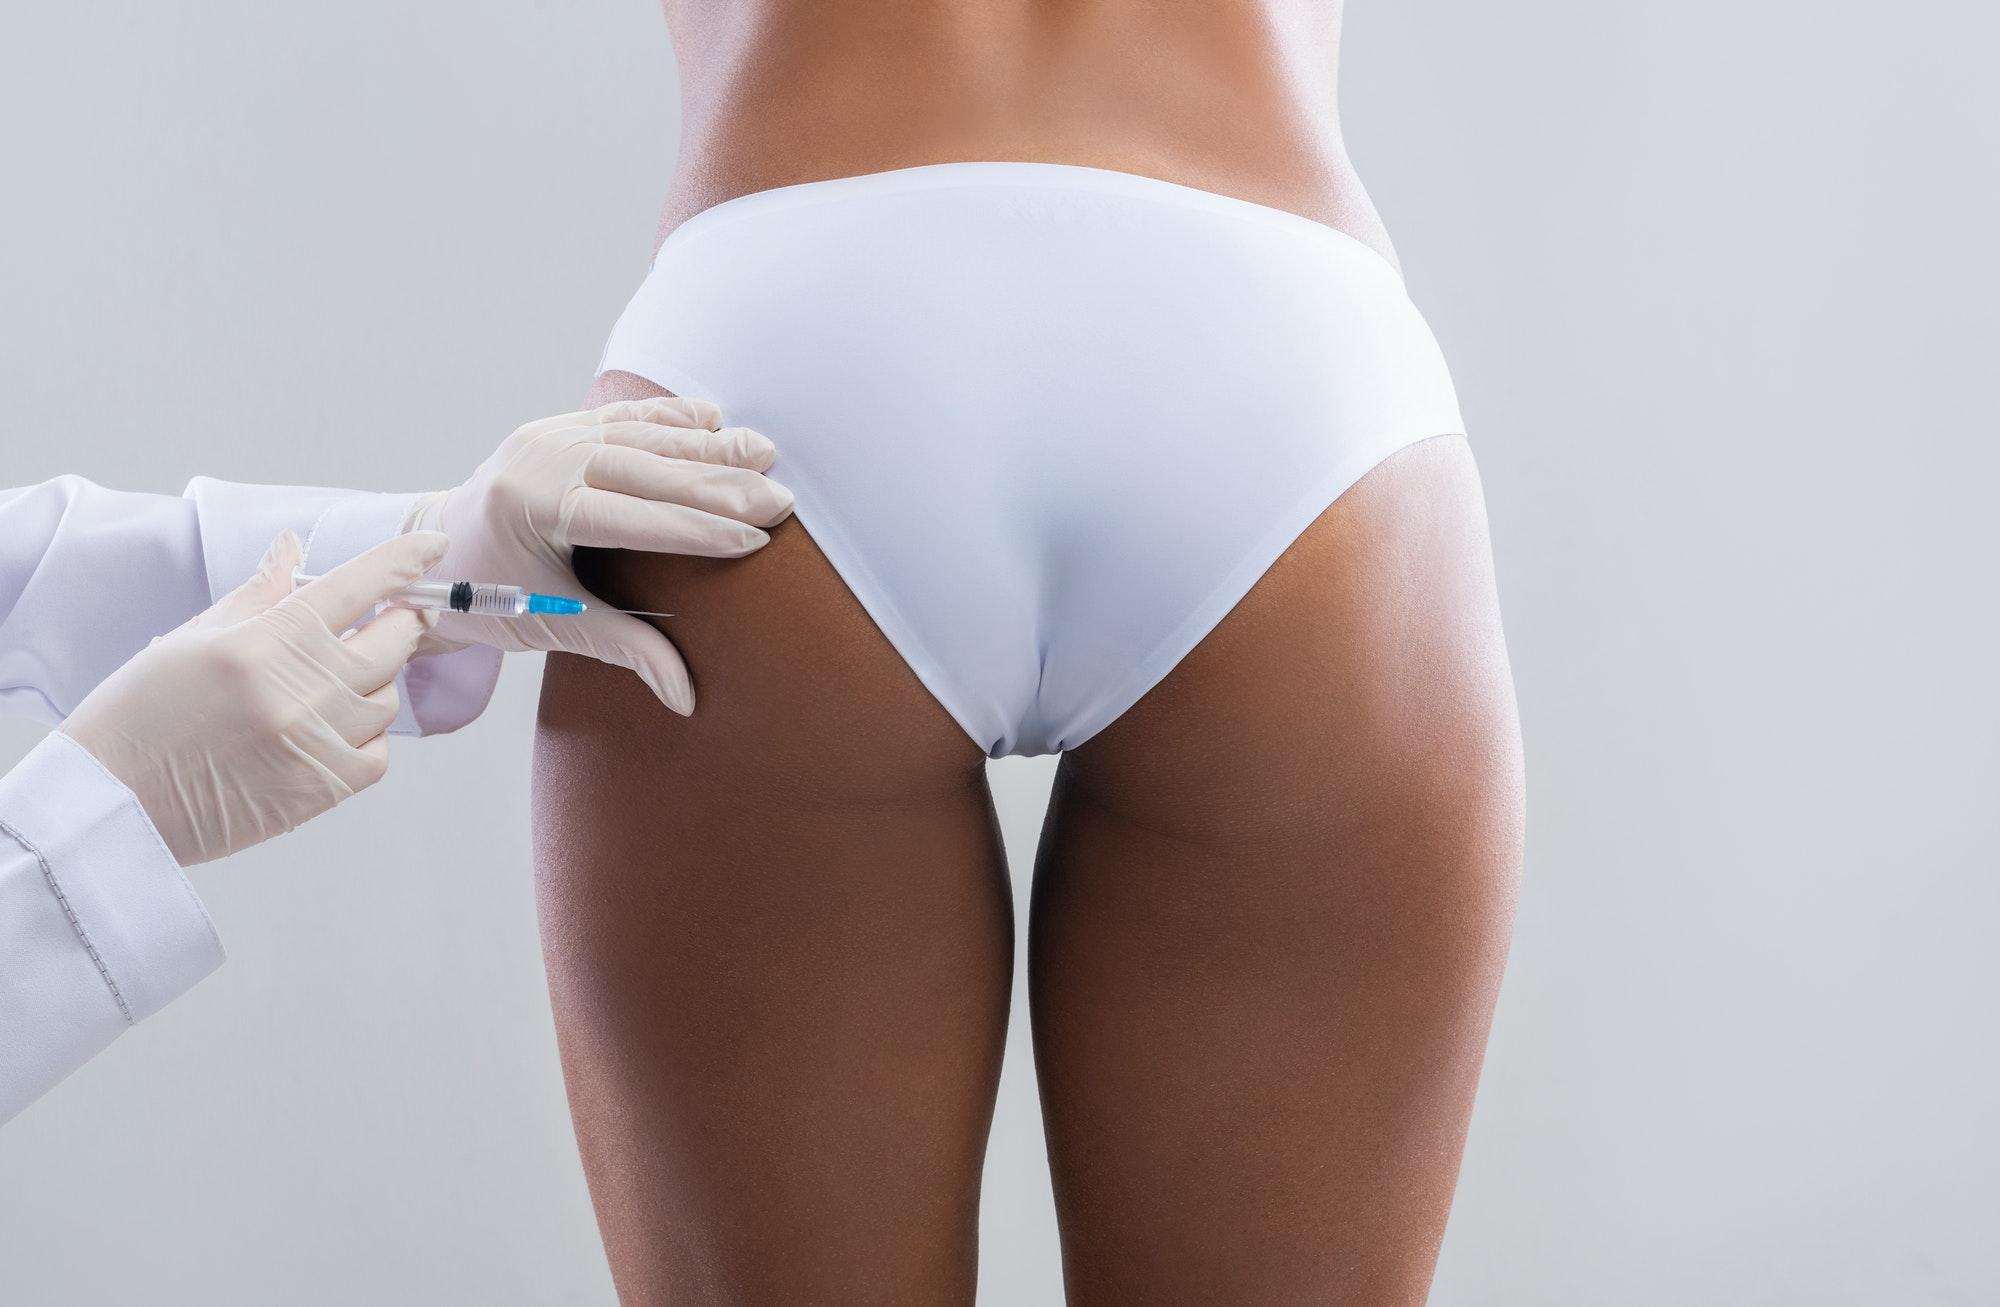 Back view of woman having lipolysis treatment at beauty salon